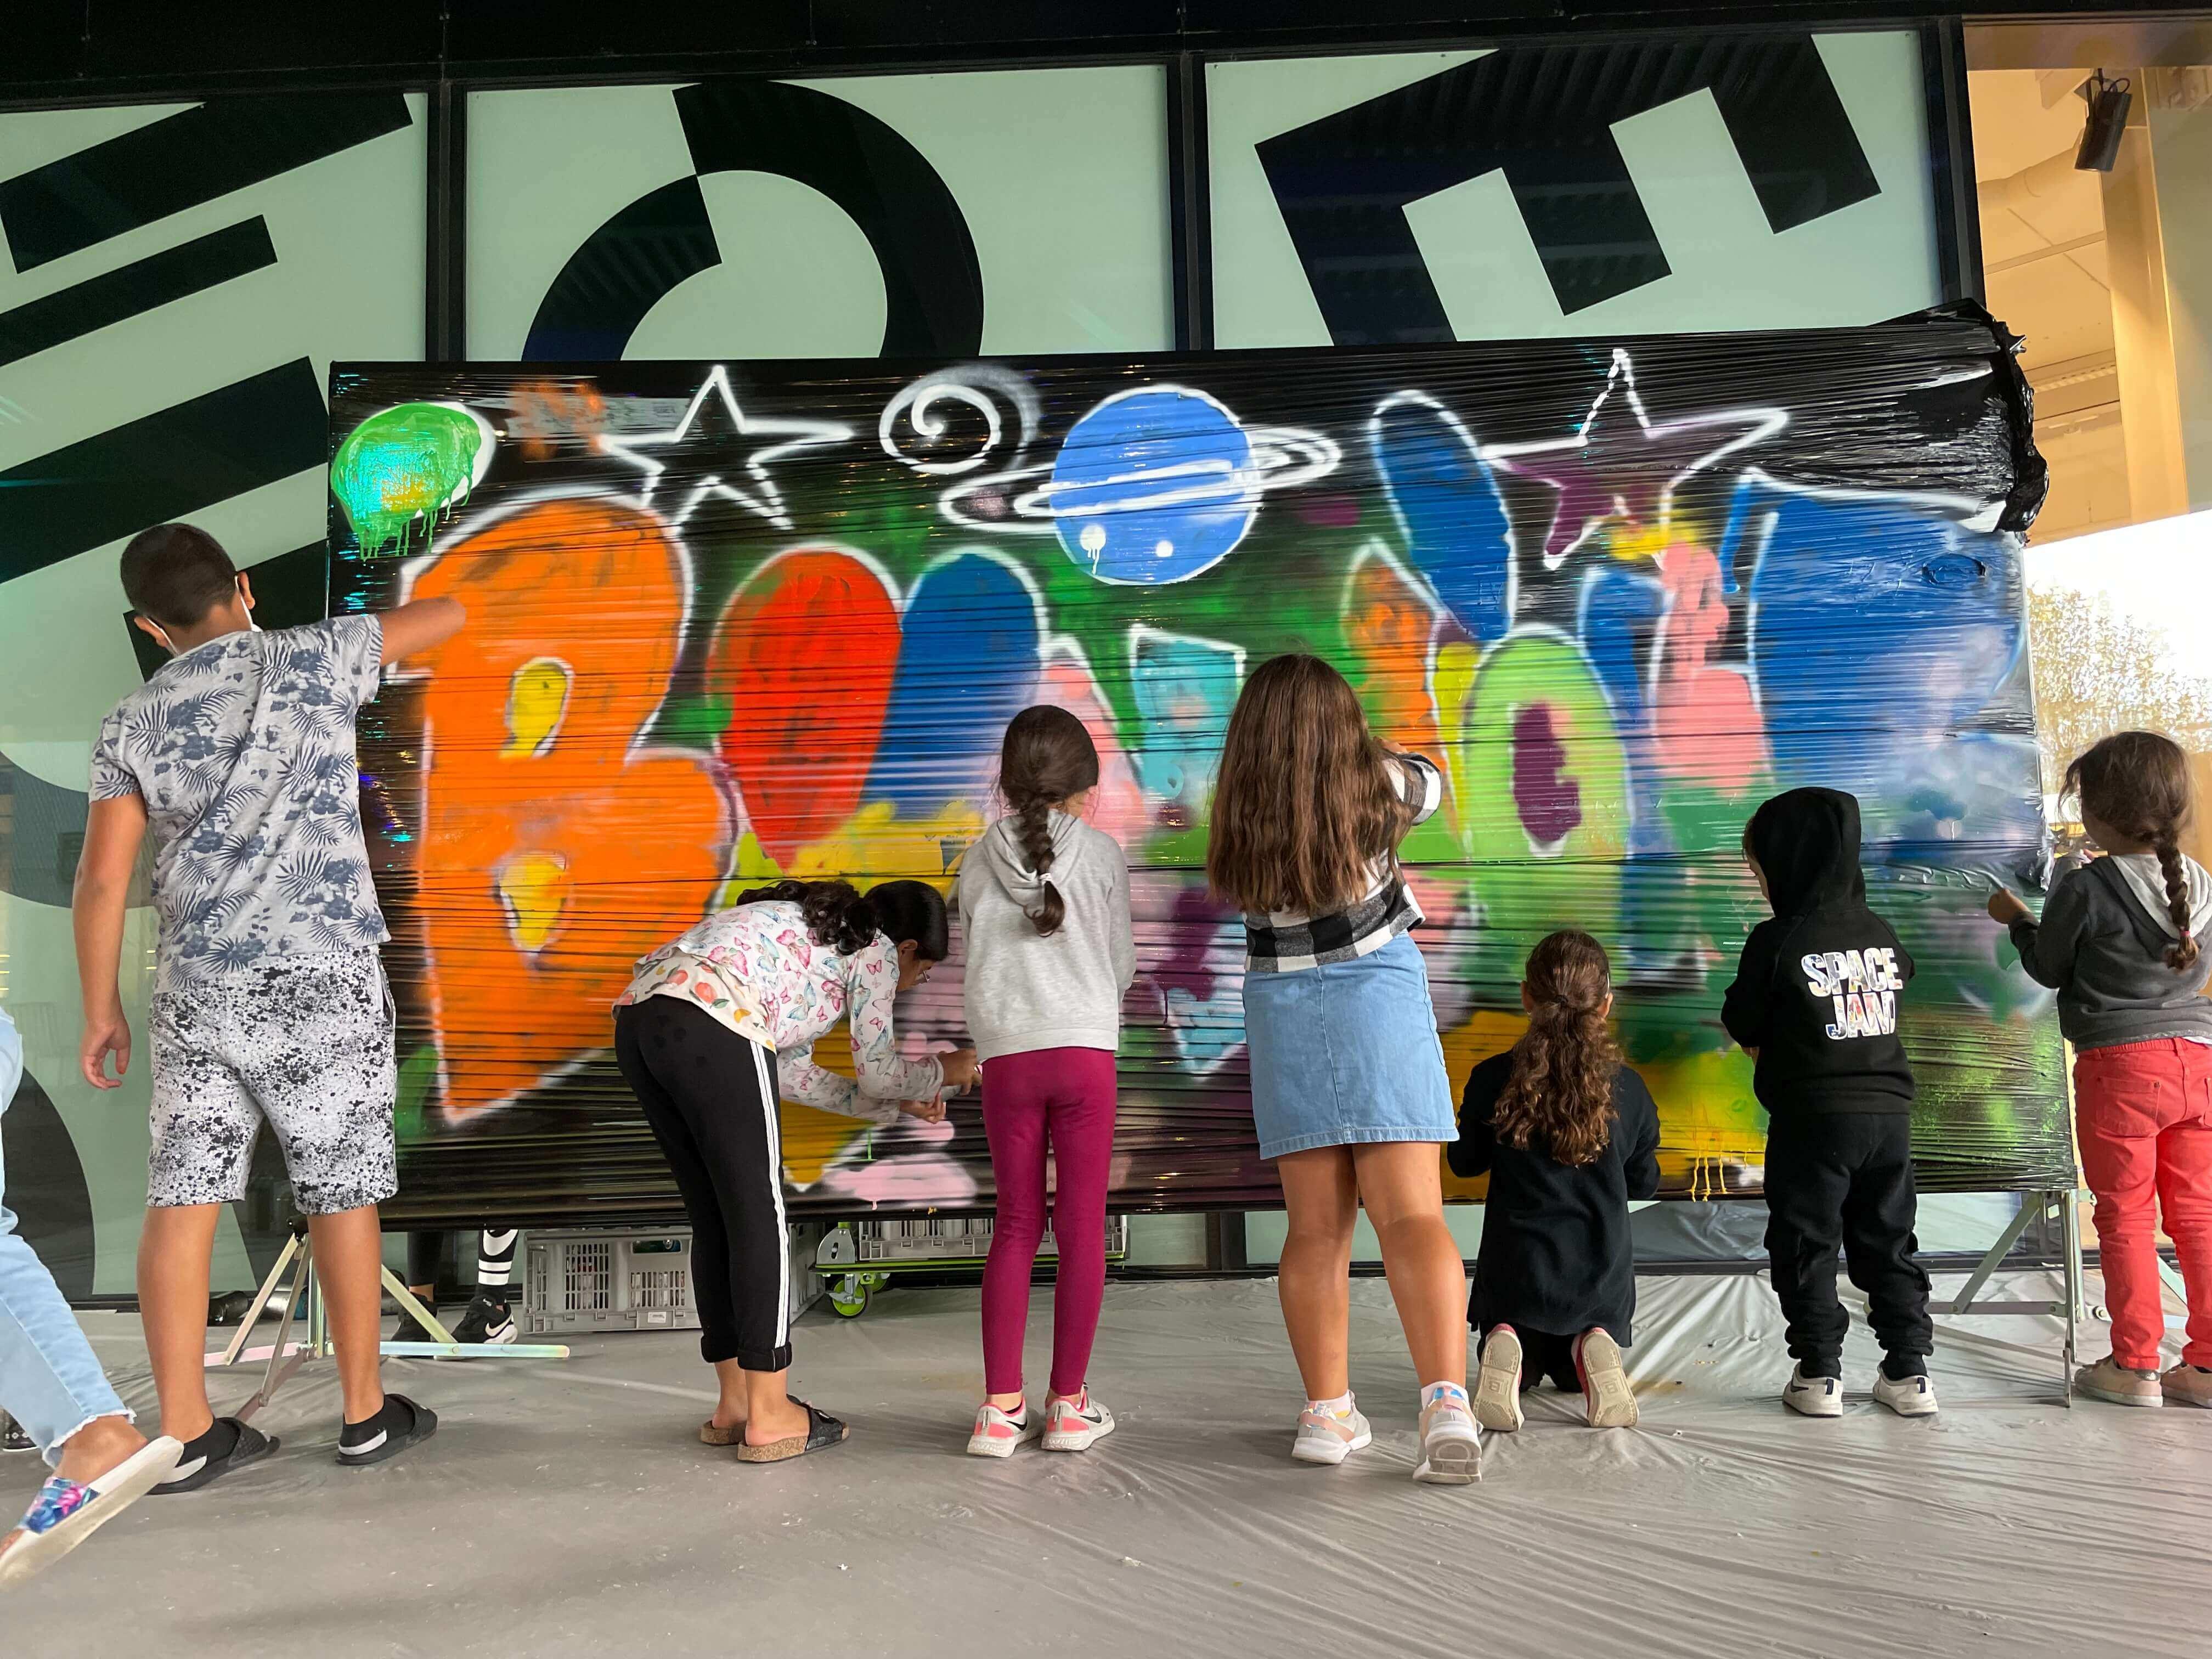 Initiation graffiti street art sur un mur en cellophane